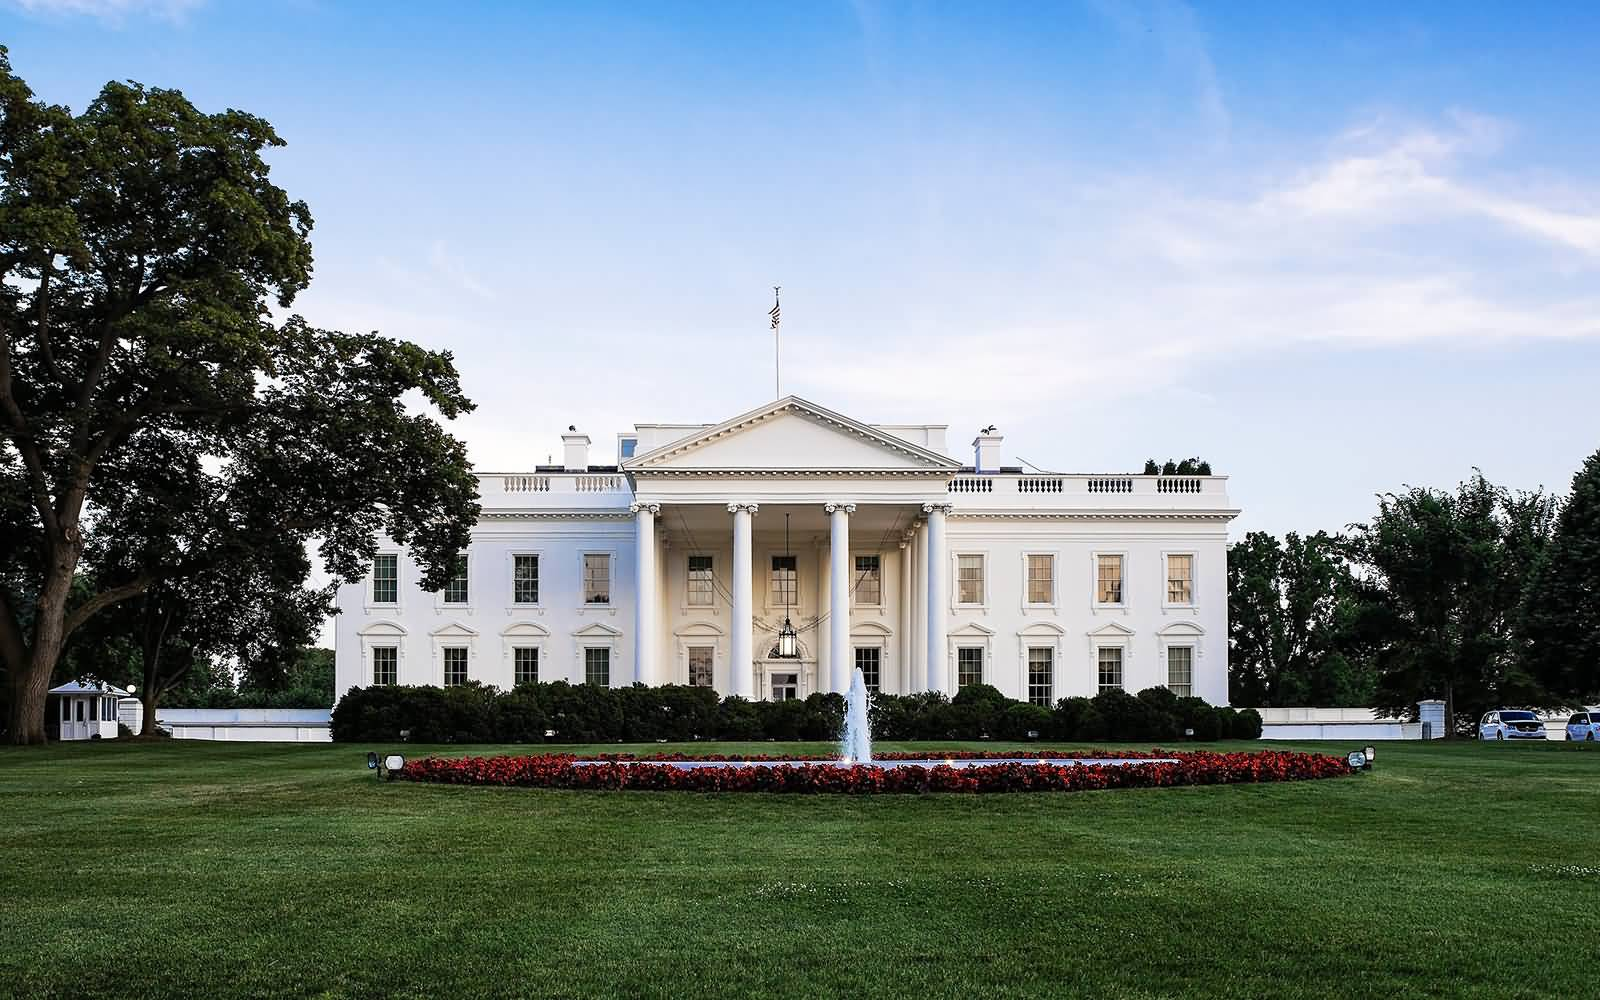 white house 2016 washington - photo #37